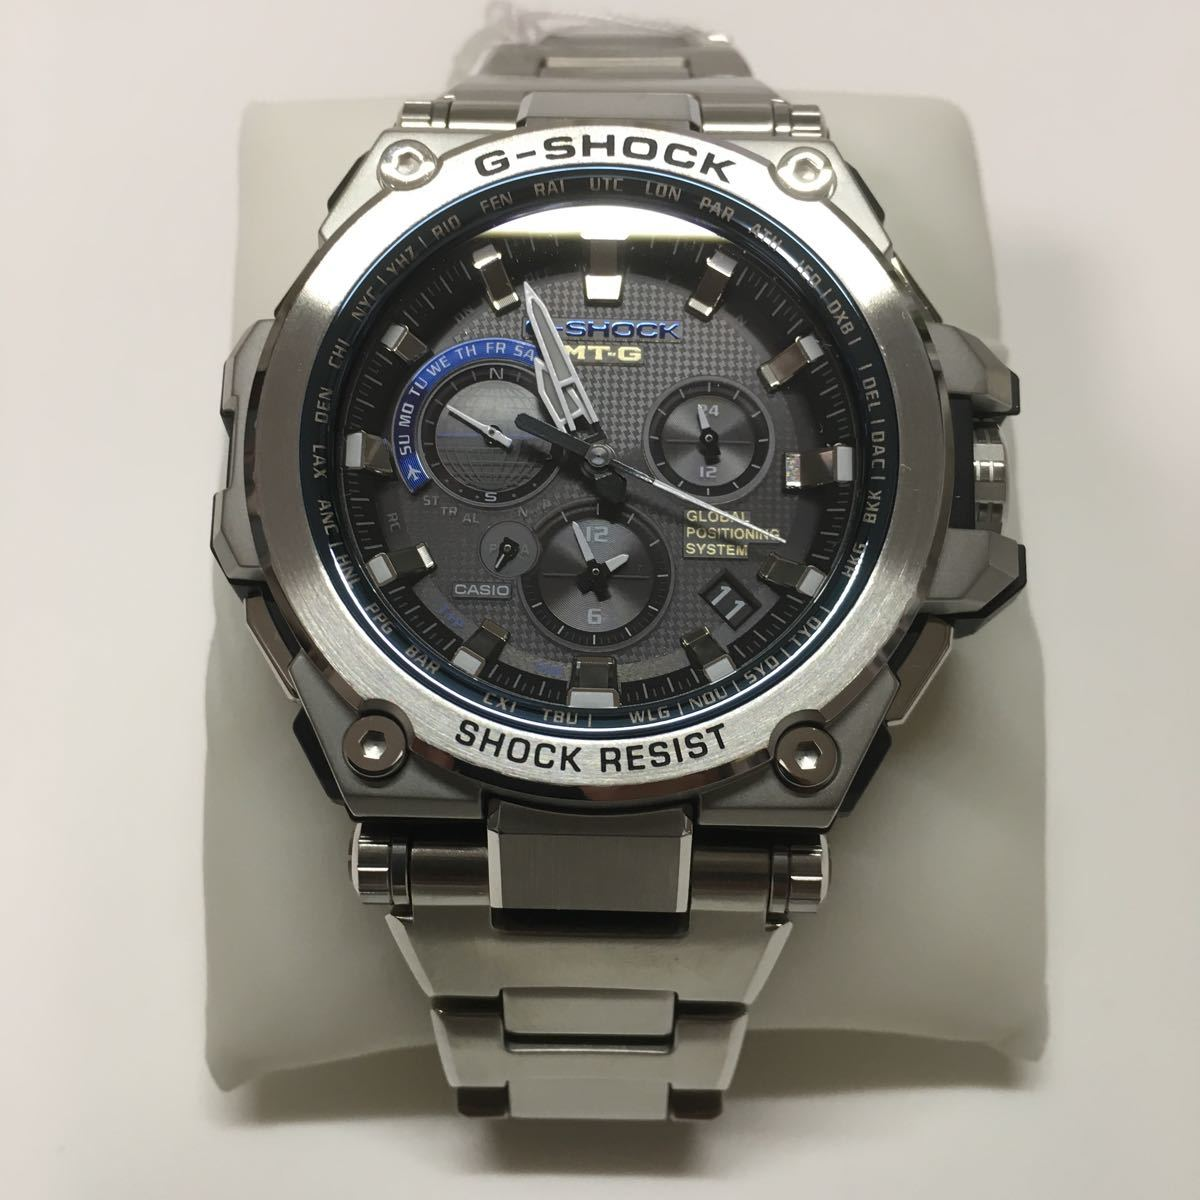 outlet store 4ddc5 33c05 Casio GPS solar radio wave wristwatch G-SHOCK MTG-G1000D ...